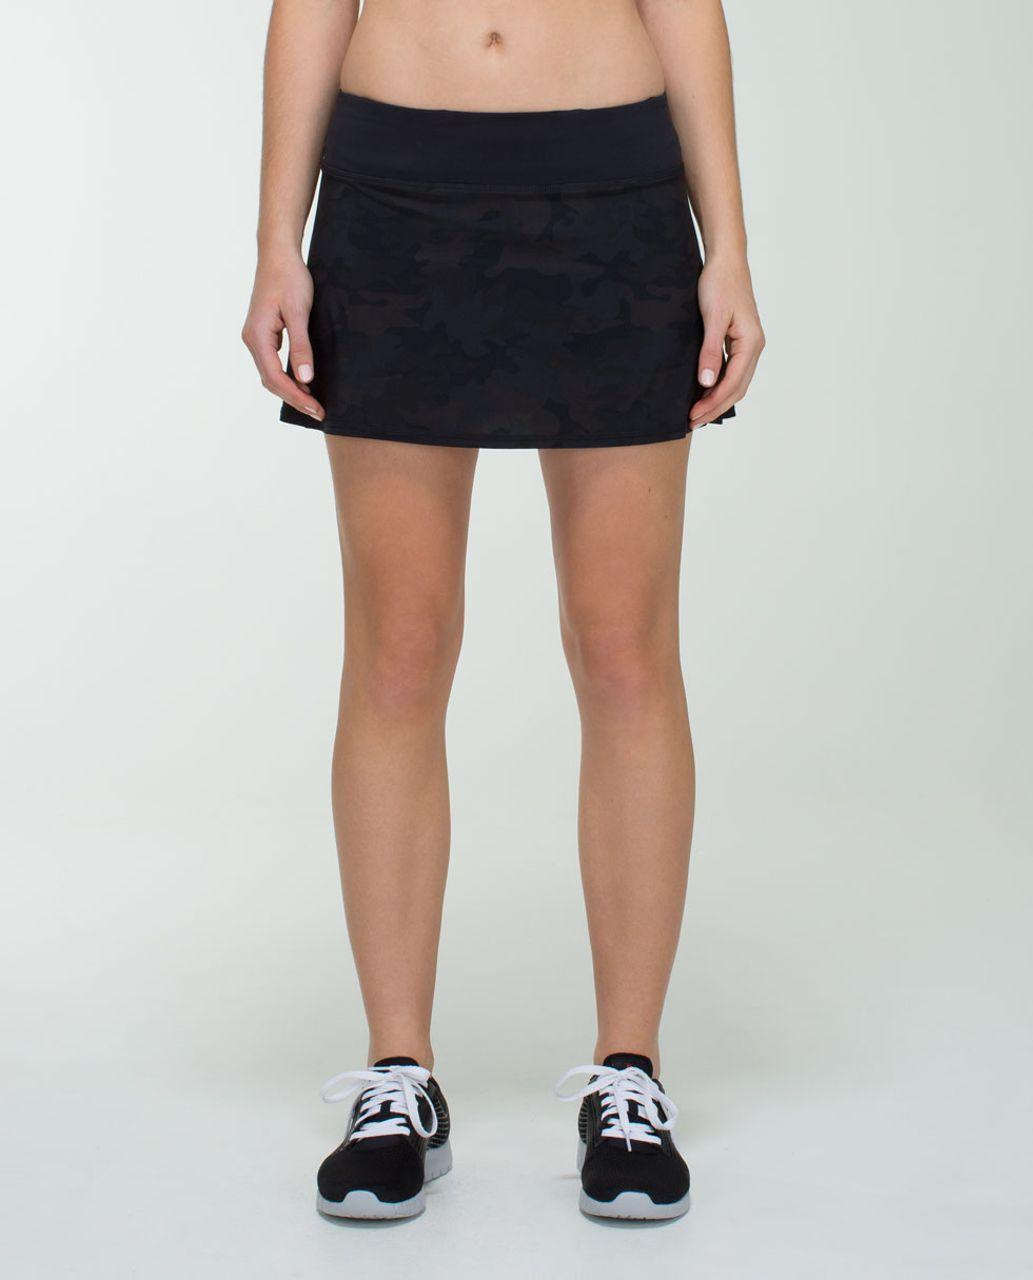 897b7a756 Lululemon Run: Pace Setter Skirt (Regular) *4-way StretchSavasana Camo 20cm  New Black / Black